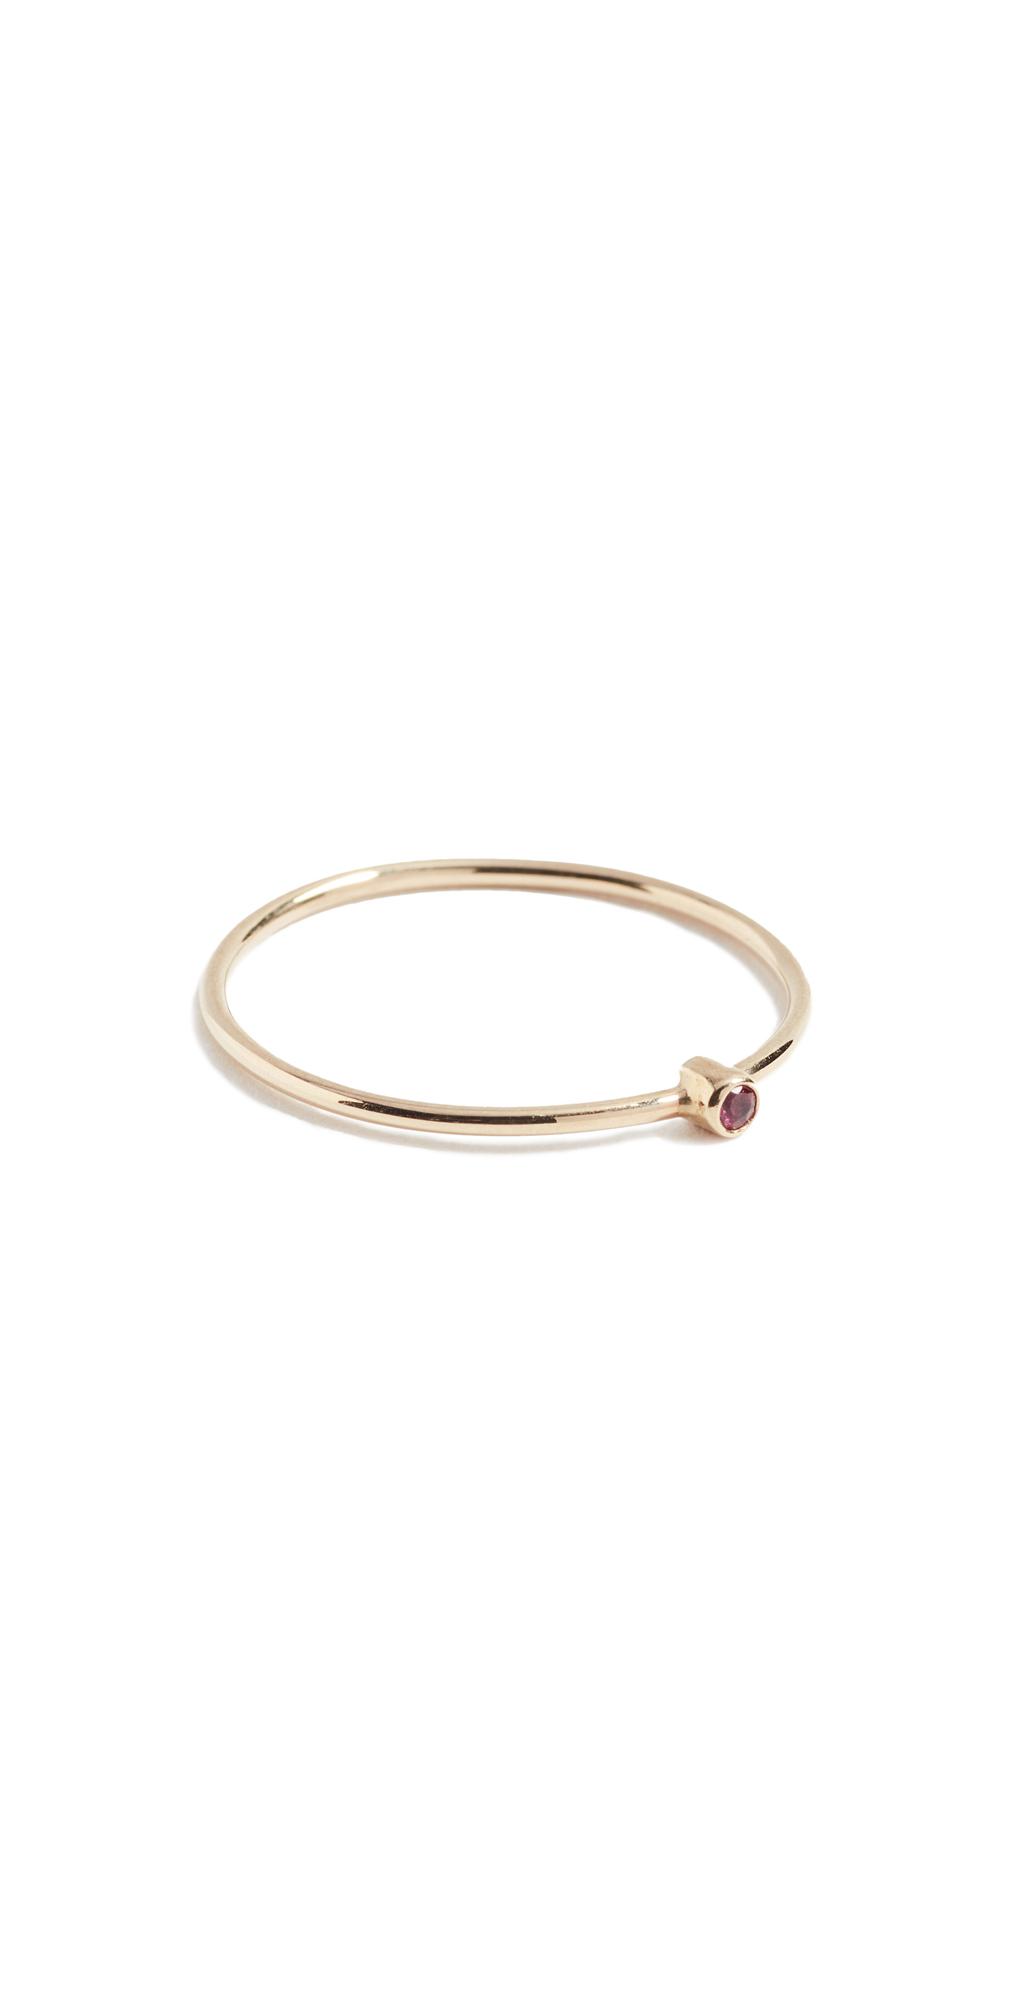 18k Gold Thin Ruby Ring